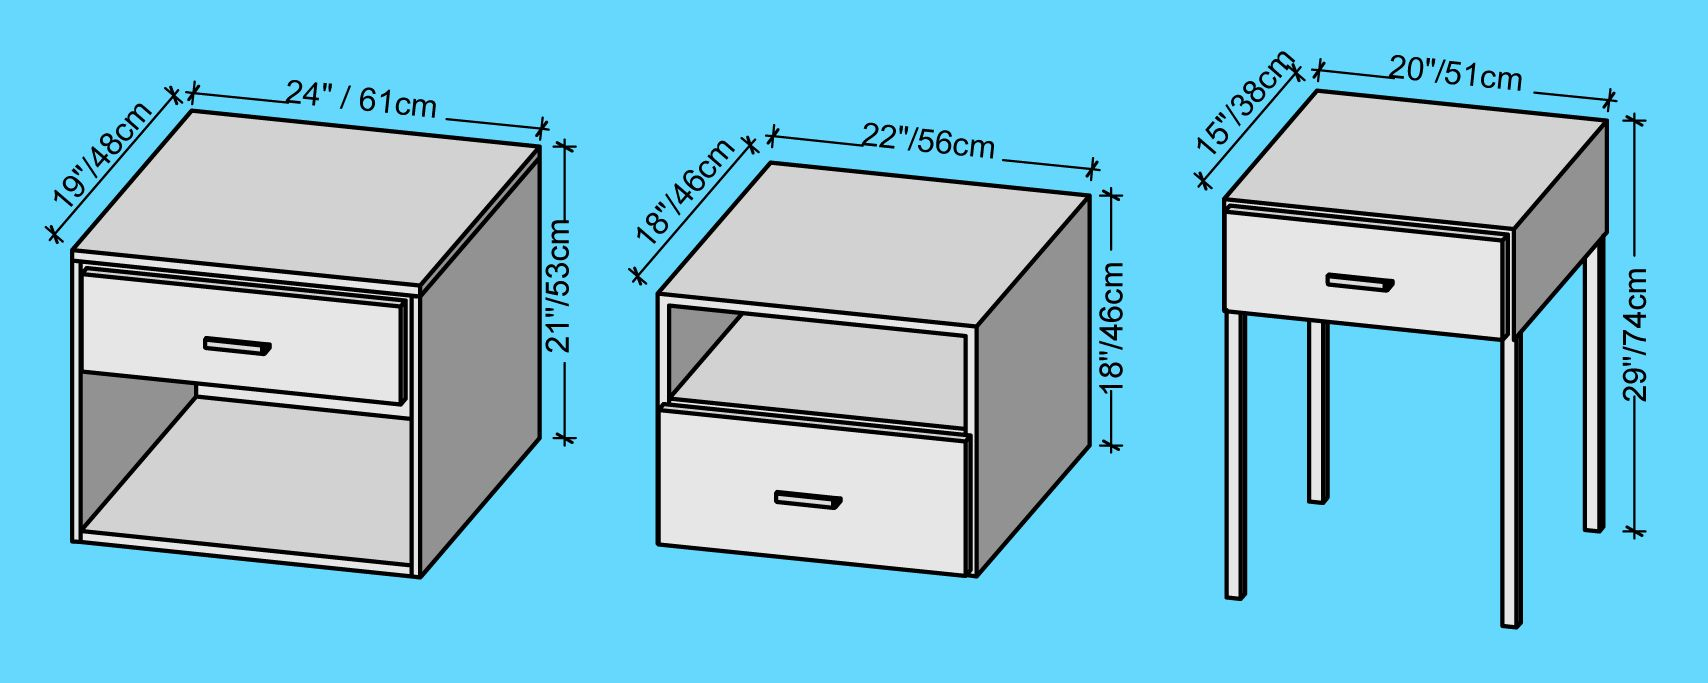 Bedside Table Dimensions Cm Standard Google Search Bedside